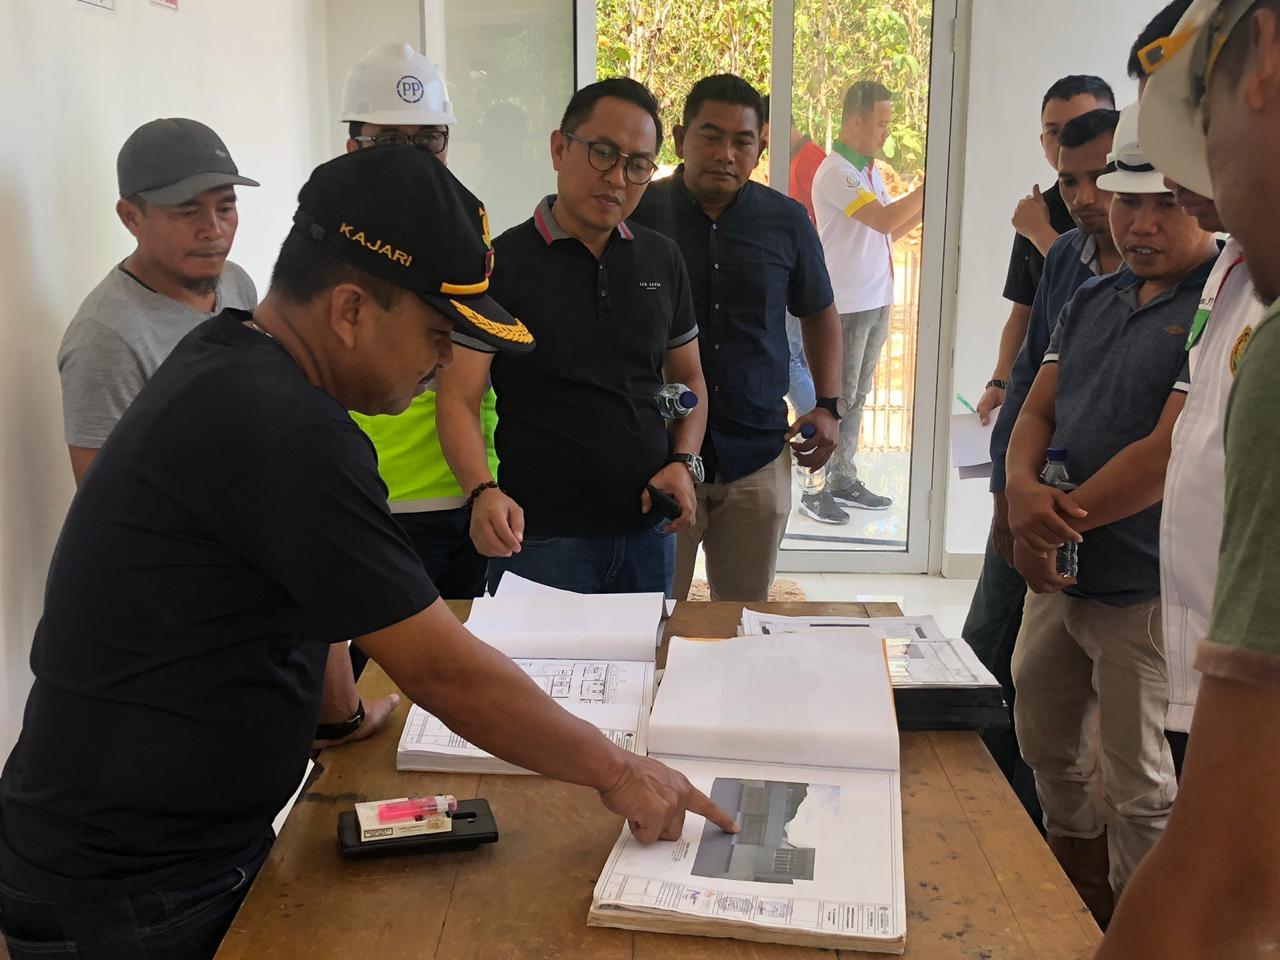 Kepala Kejaksaan Negeri (Kajari) Konawe, Jaja Raharja, S.H., M.H. melakukan kunjungan kerja untuk meninjau pembangunan baru gedung Puskesmas Kecamatan Soropia dan Lalonggasumeeto